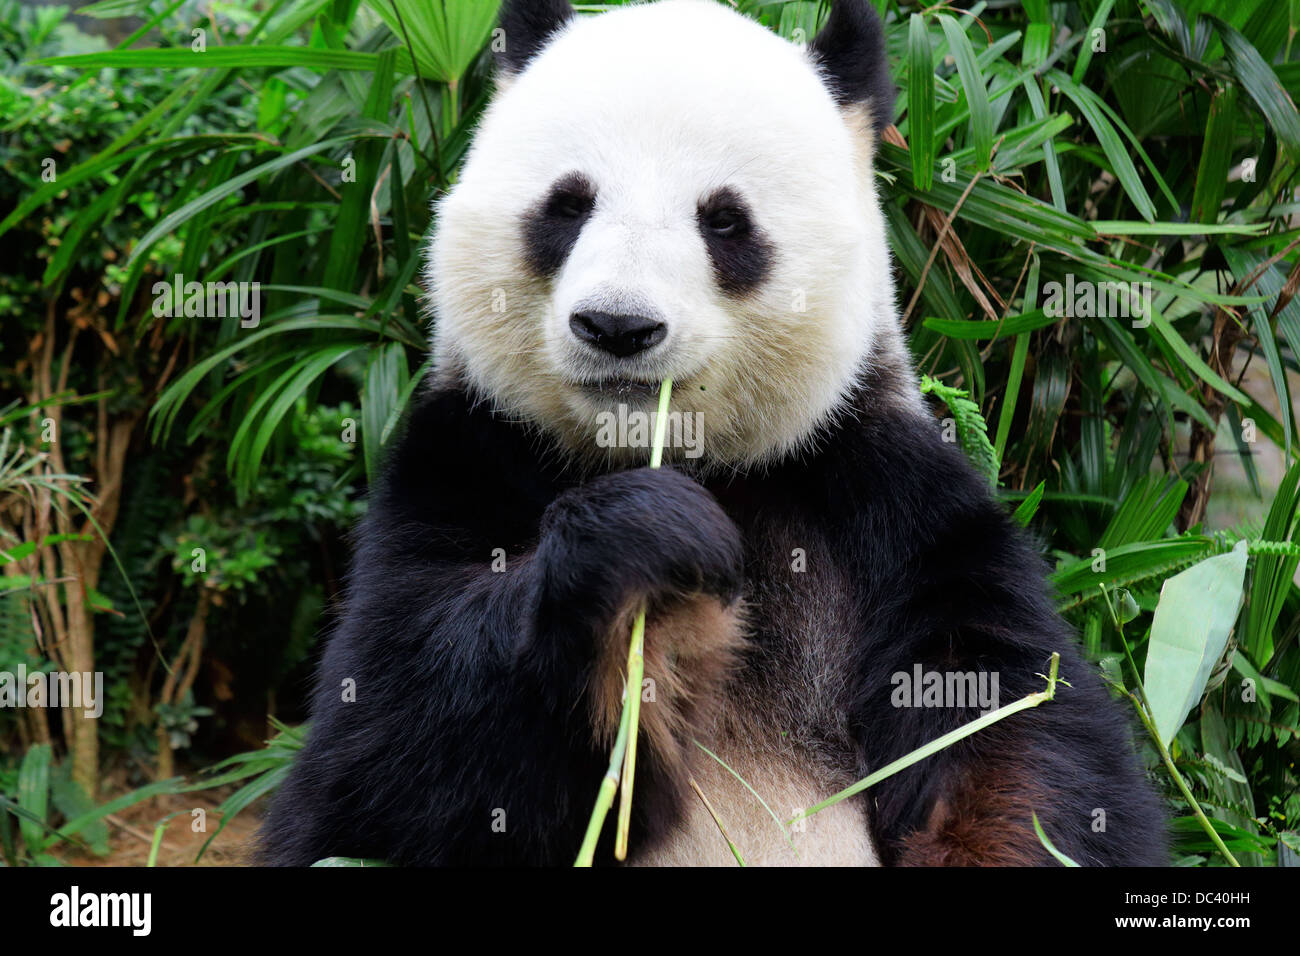 Panda Bambus Essen Stockfoto Bild 59095277 Alamy